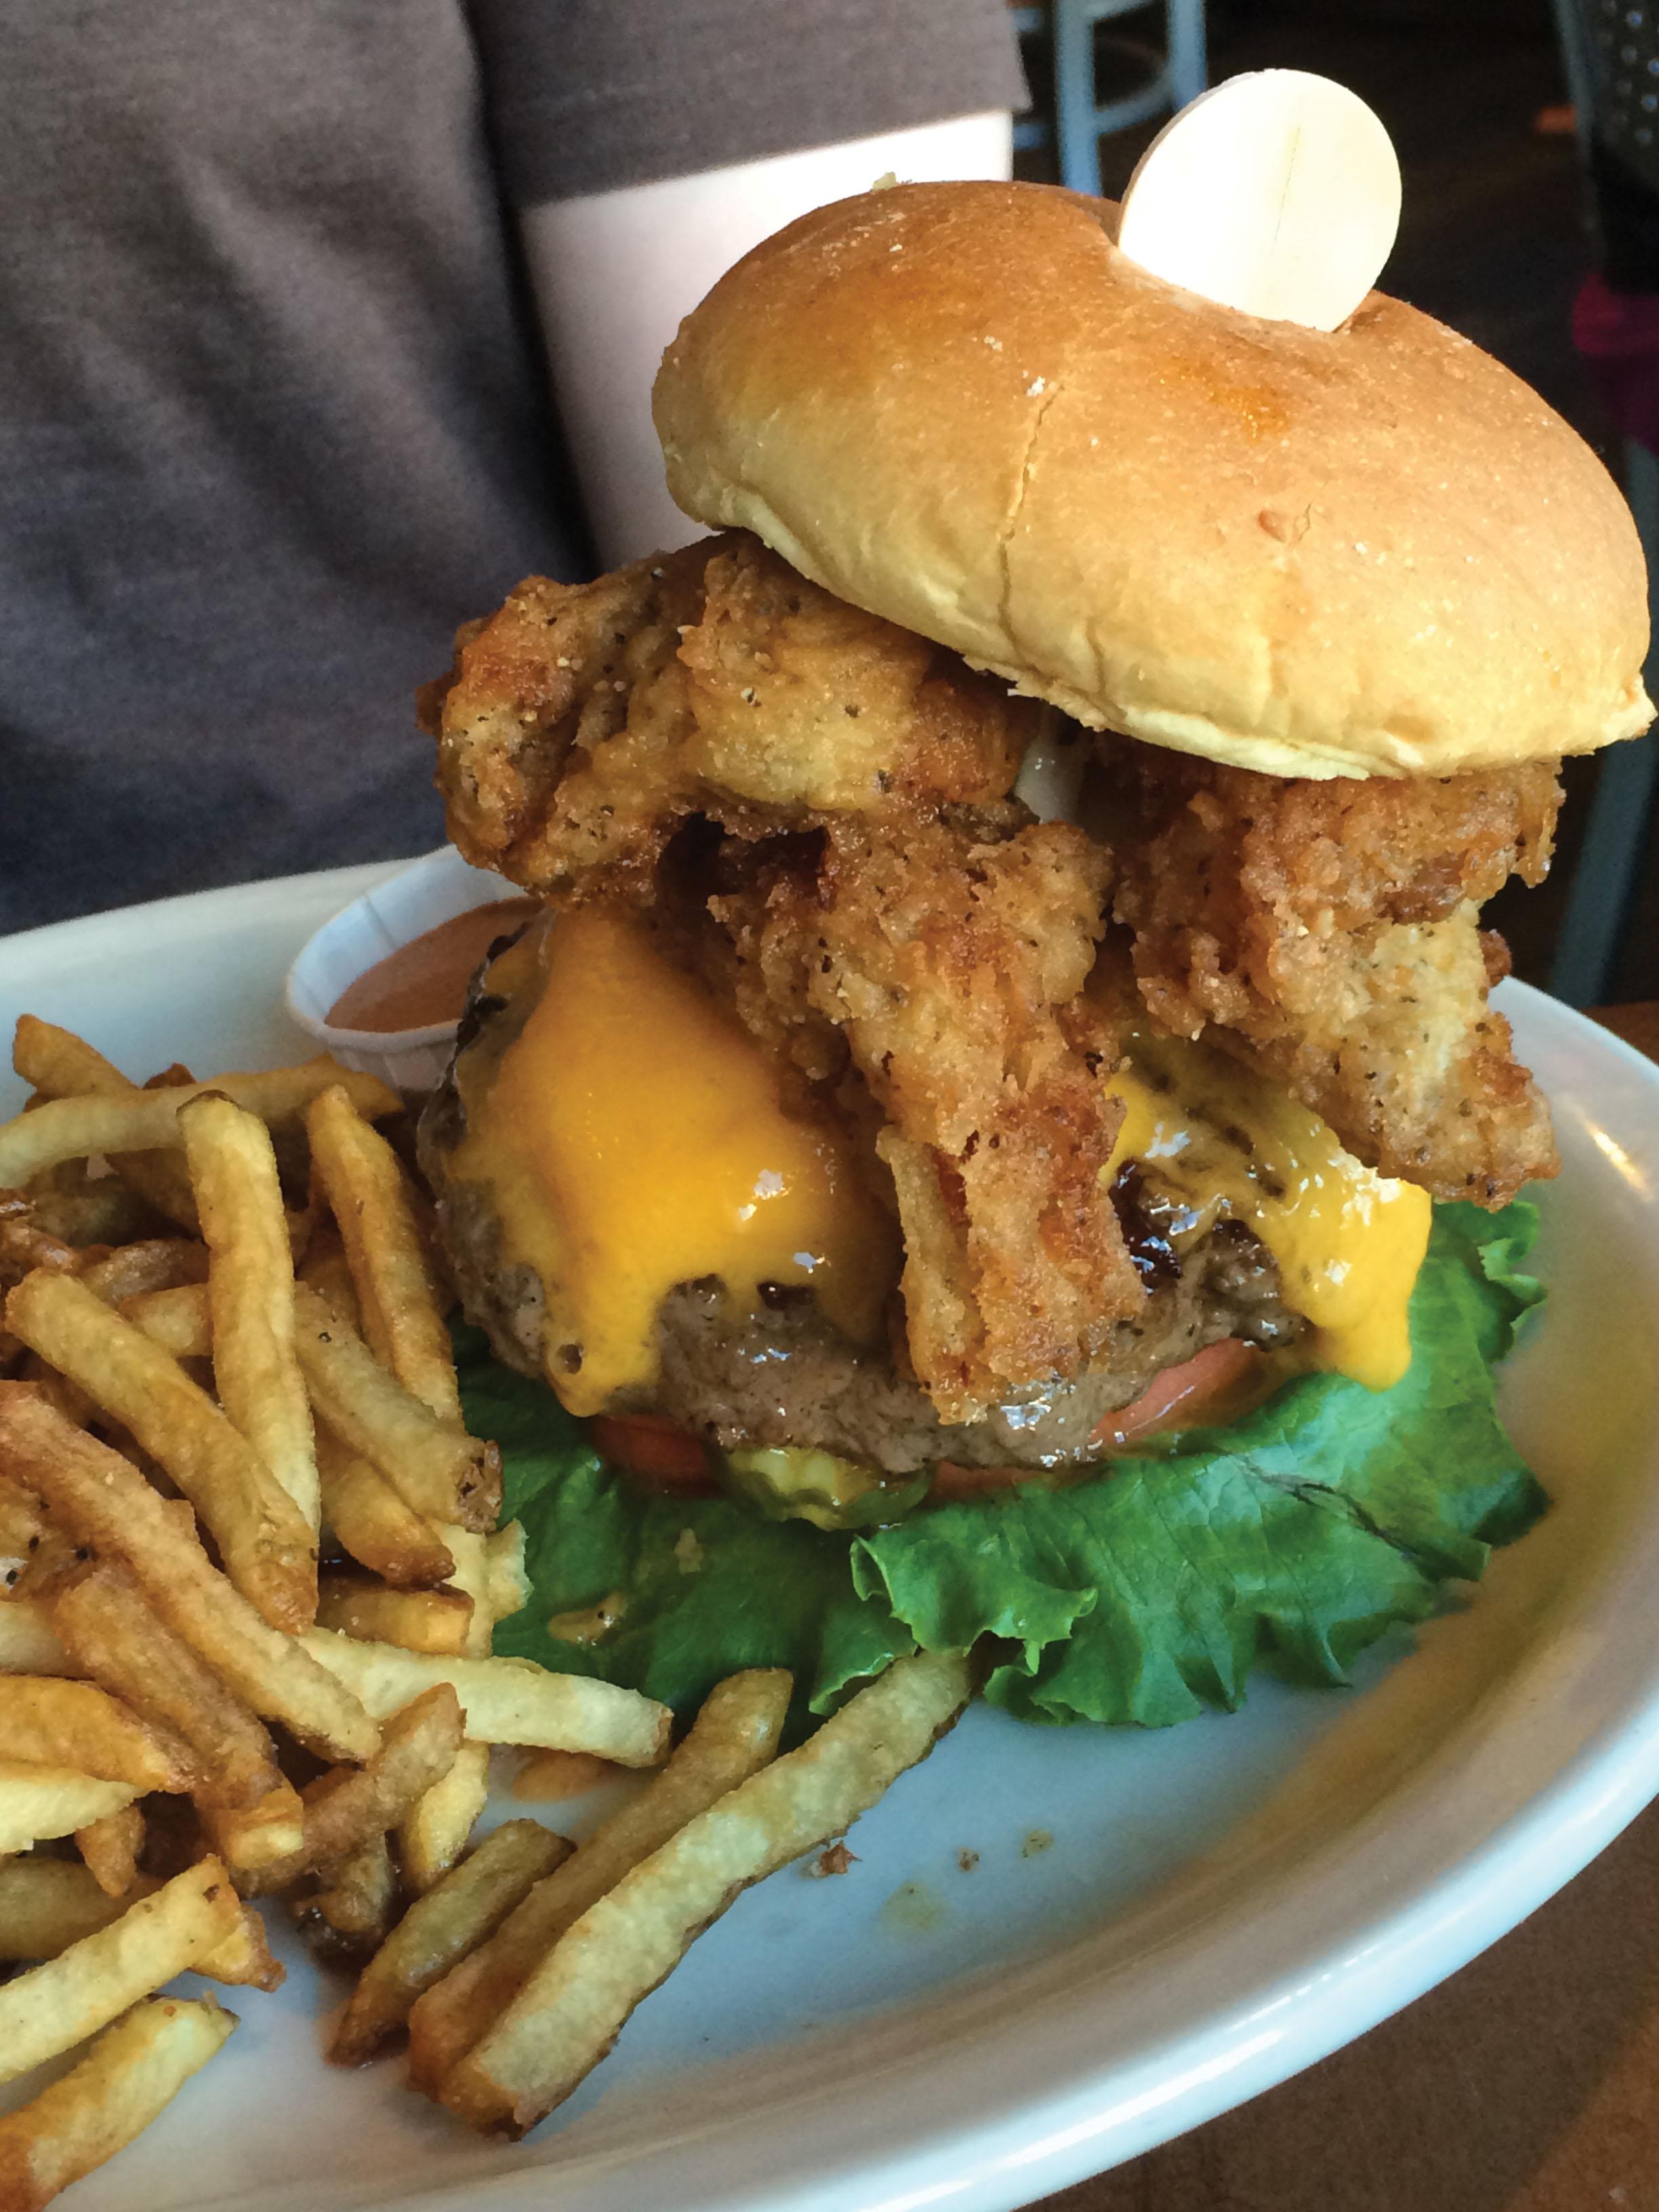 best burger Bad Daddy's Burger Bar  photo by jennifer heinser